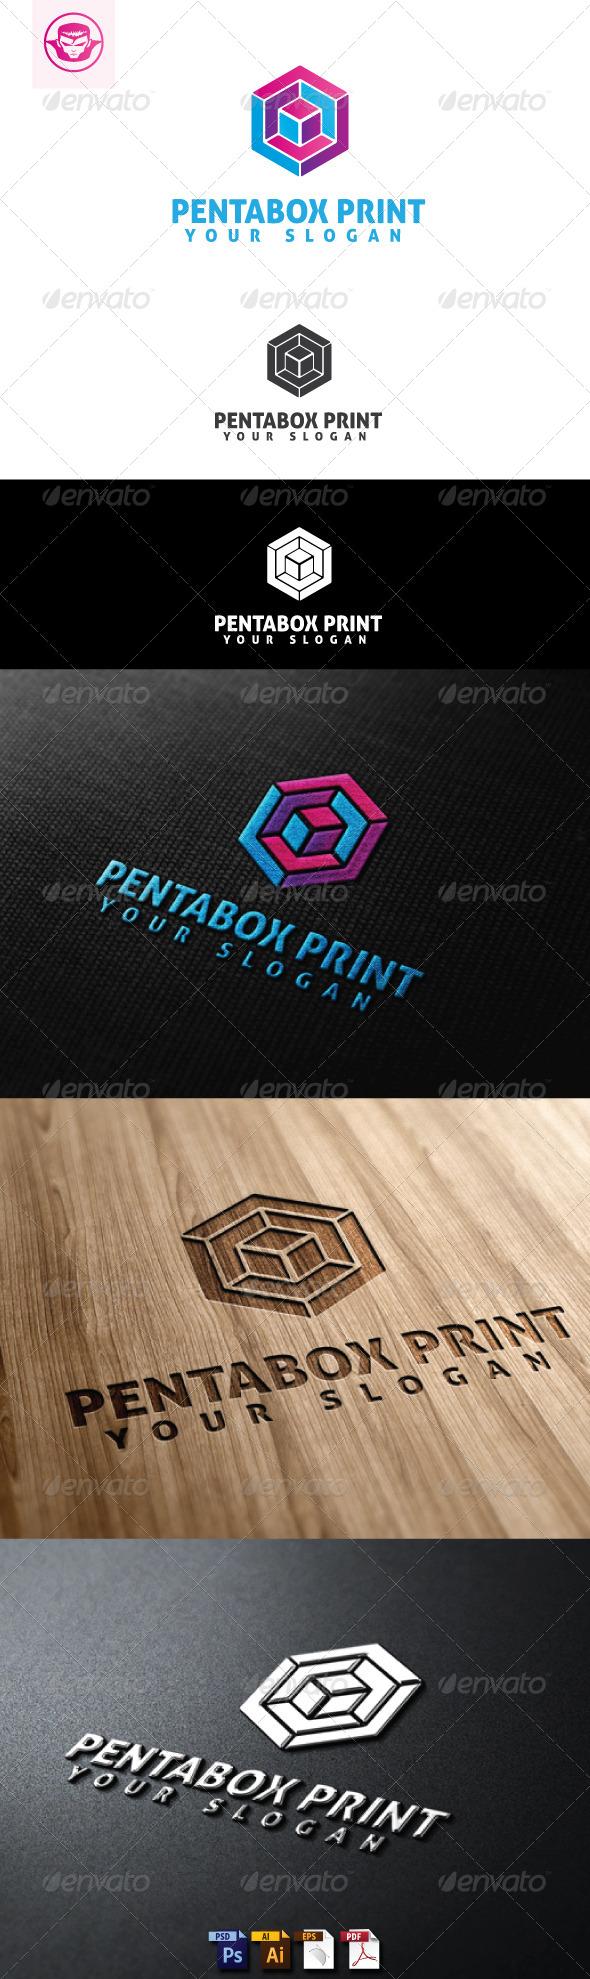 GraphicRiver Pentabox Print Logo Template 5147274